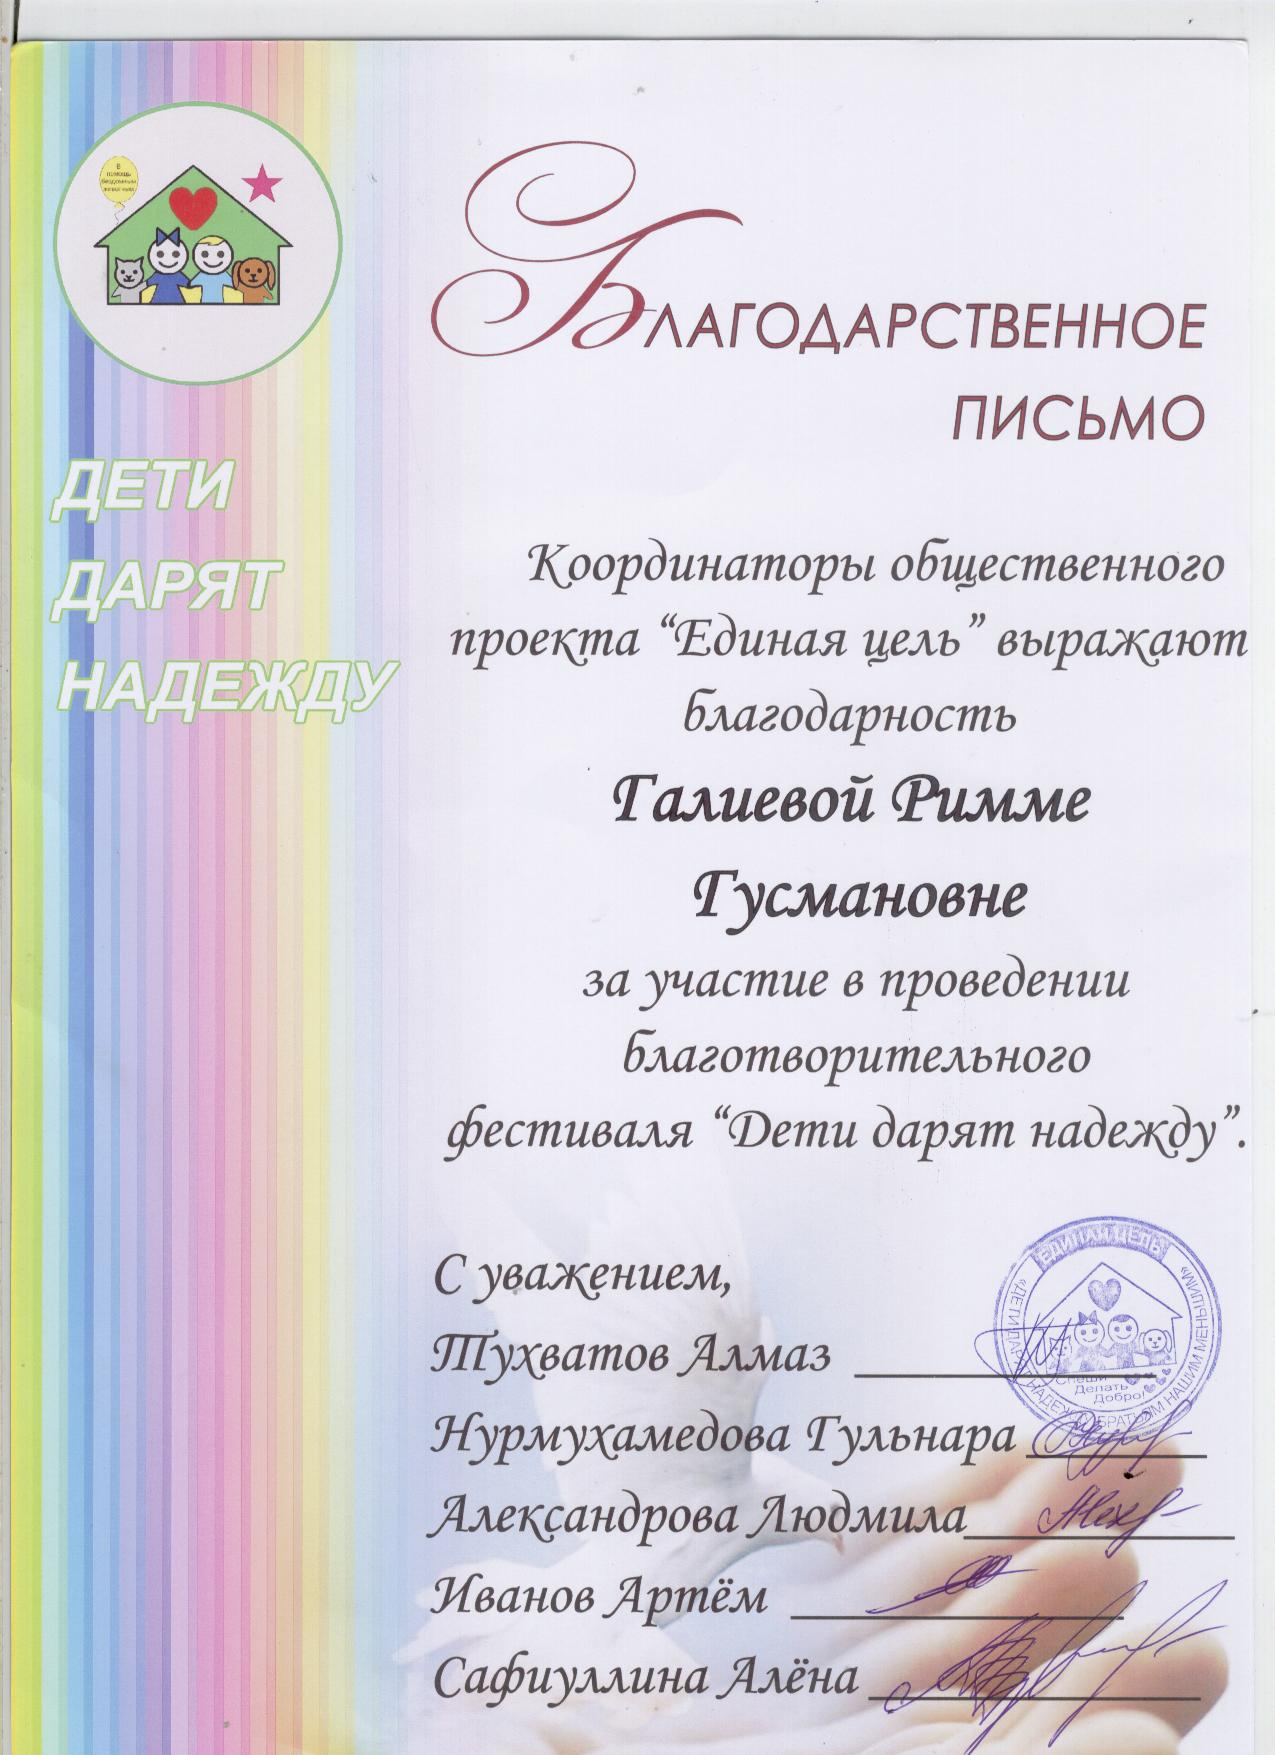 F:\Всероссйский конкурс Портфолио выпускника\РИММА\Римма 014.jpg